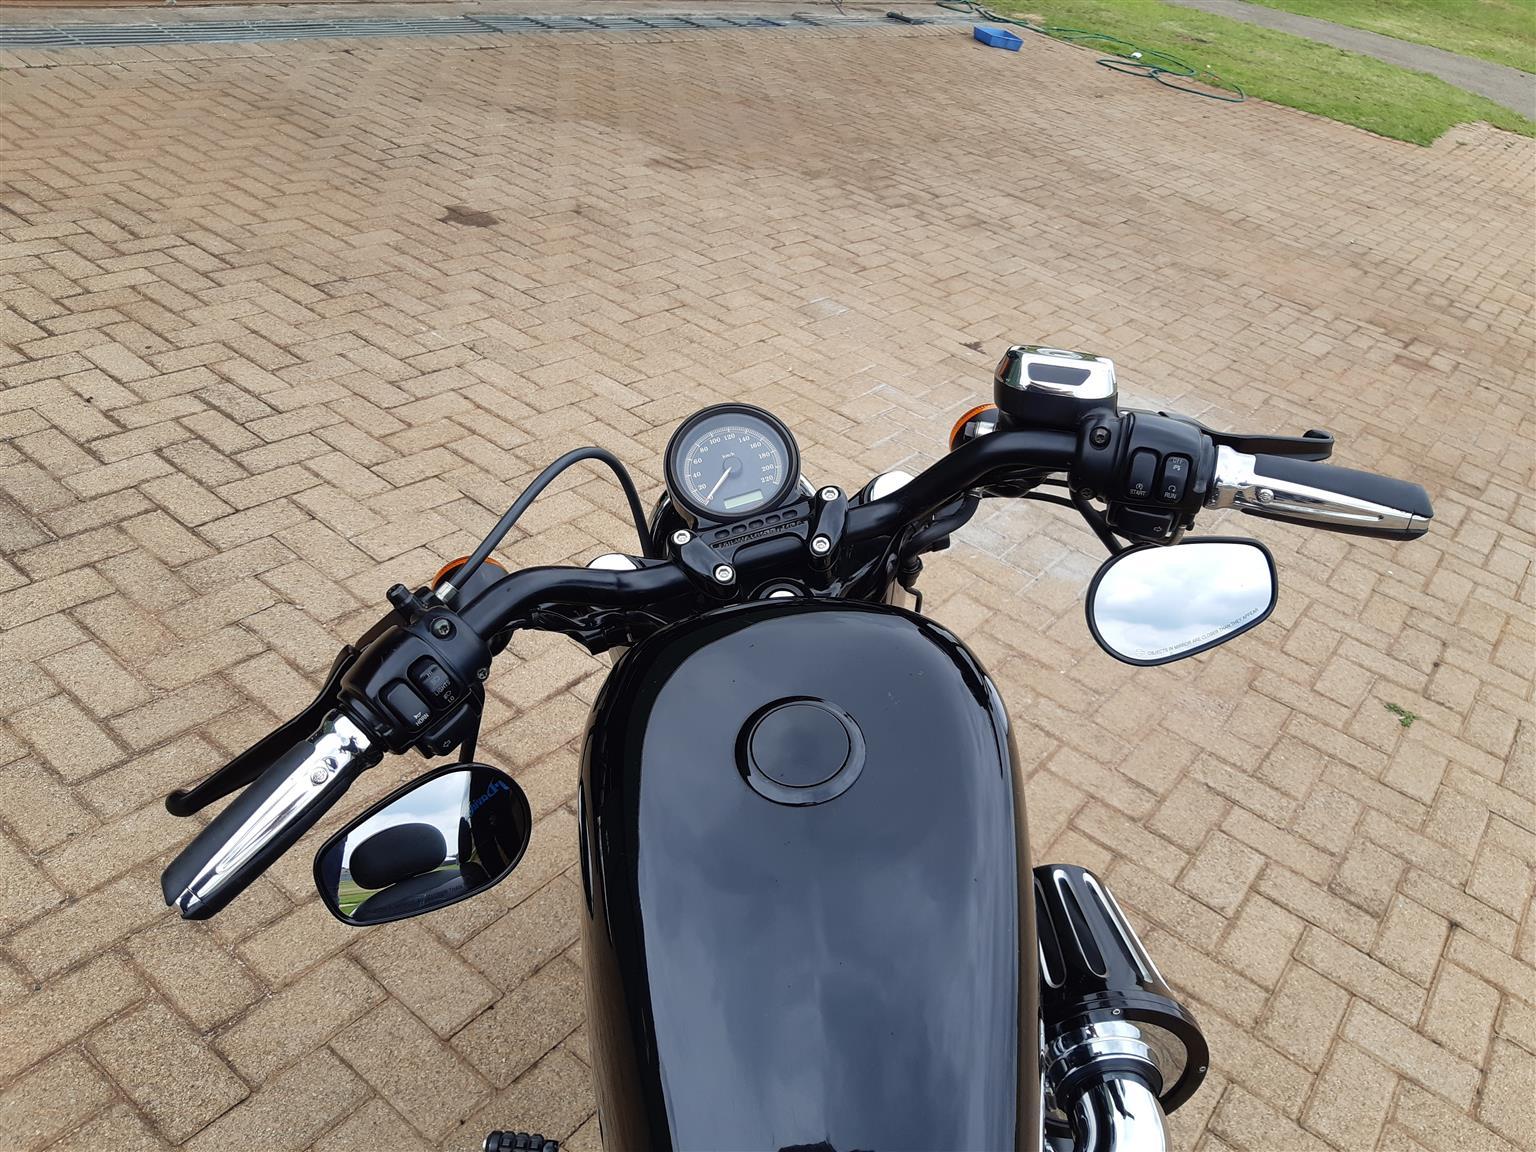 2012 Harley Davidson XL1200